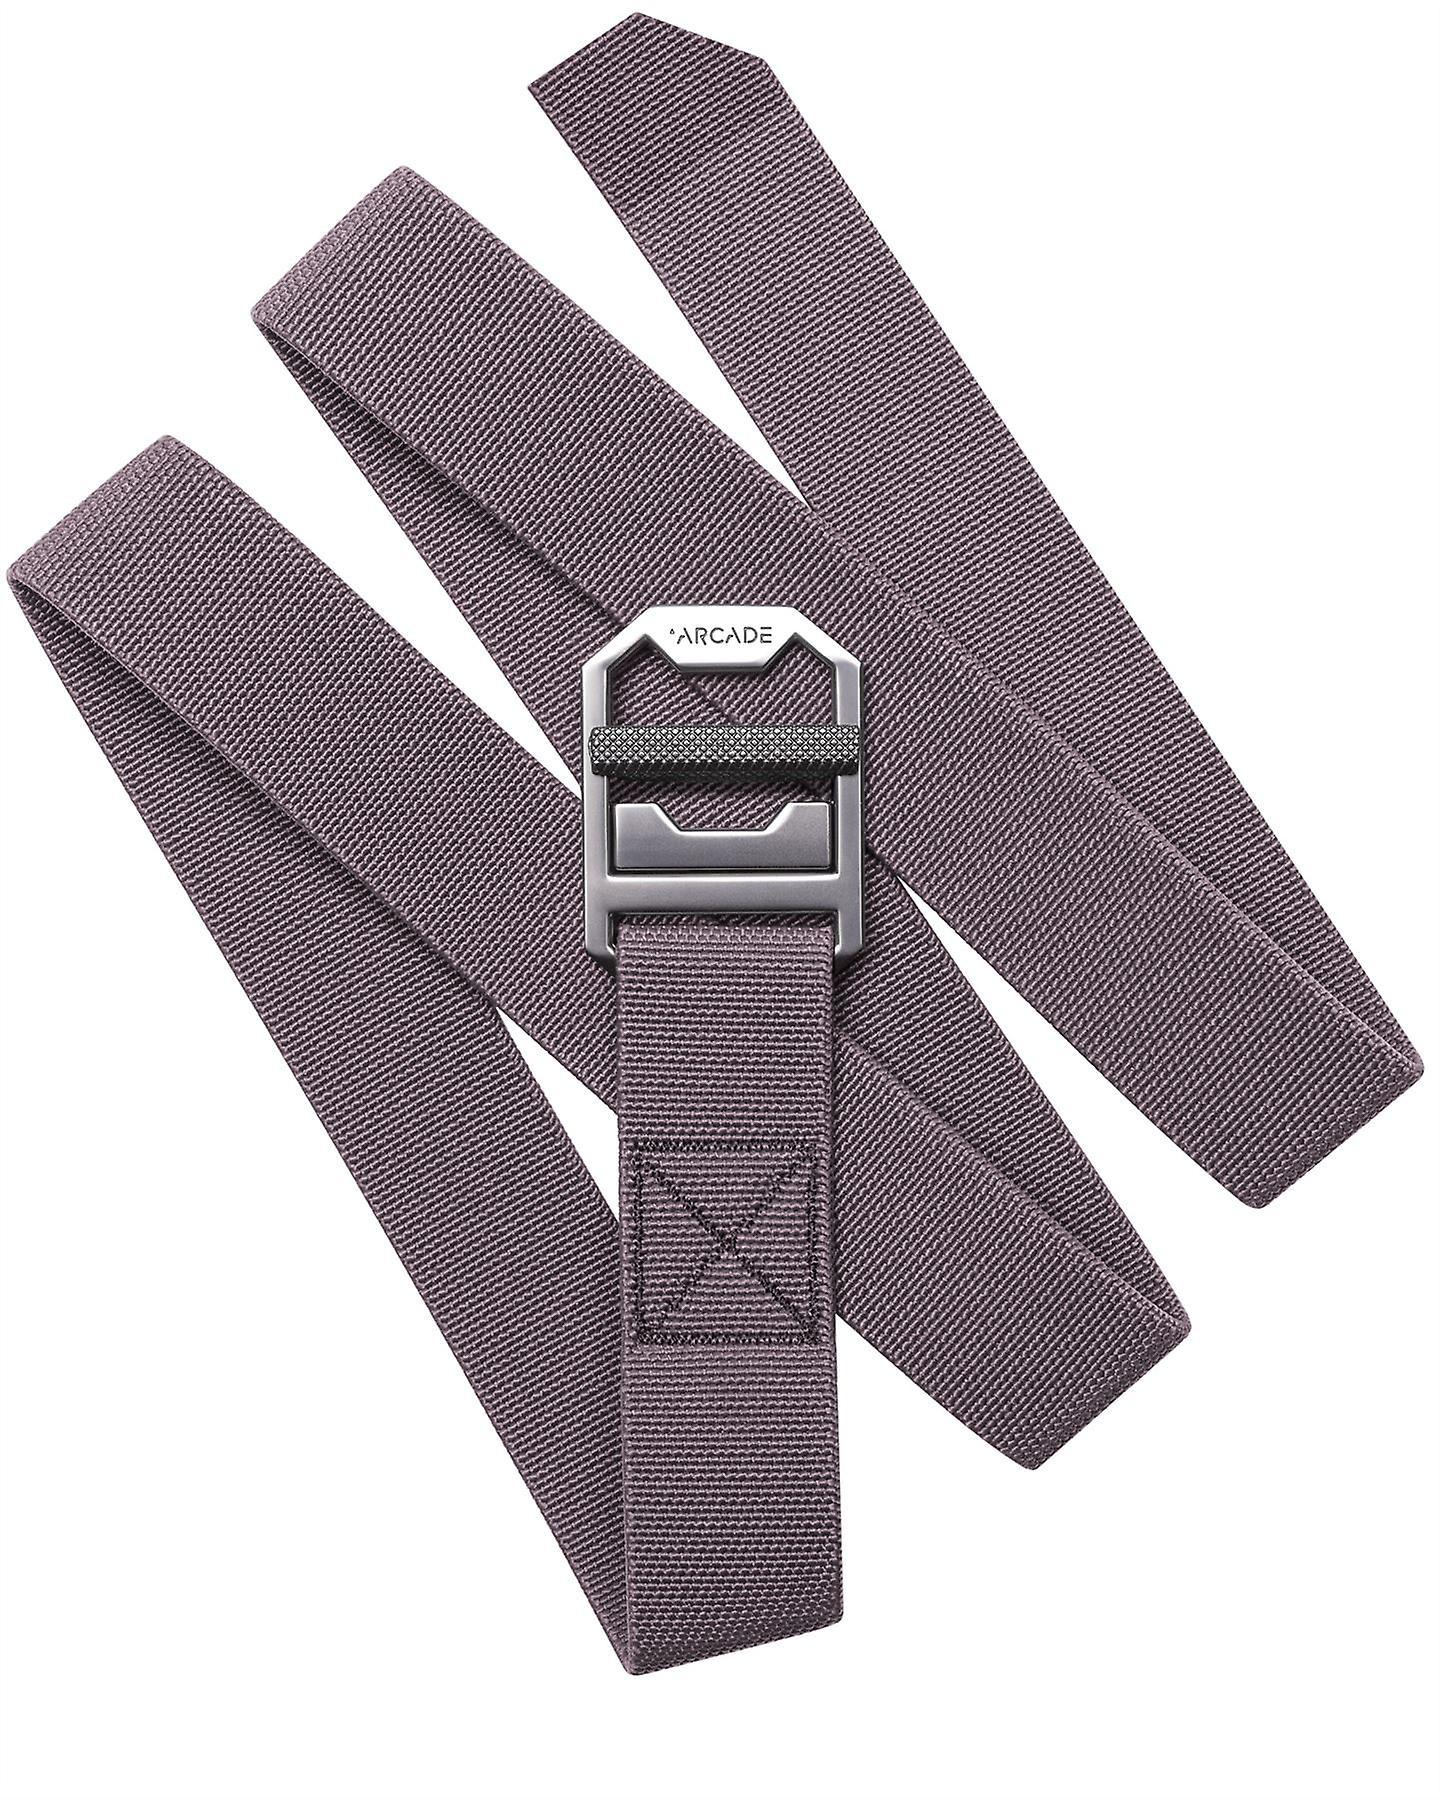 Arcade Utility Slim Range Web Belt ~ Guide purple